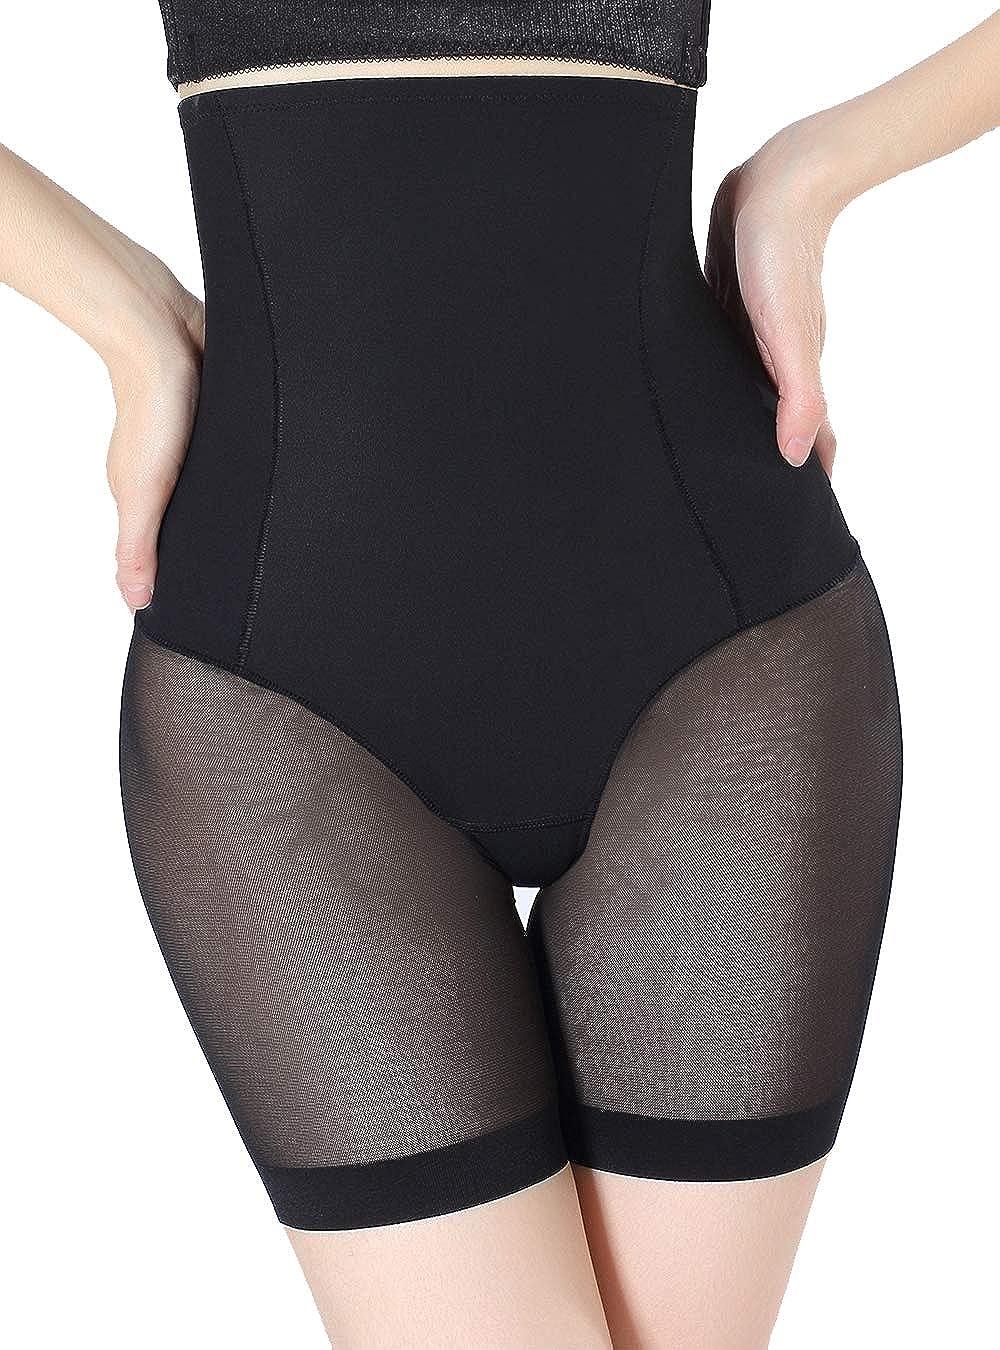 VENDAU Women High Waisted Waist Shapewear Shorts Body Shaper Underwear Tummy Control Mid-Thigh Panties Bodysuit Short